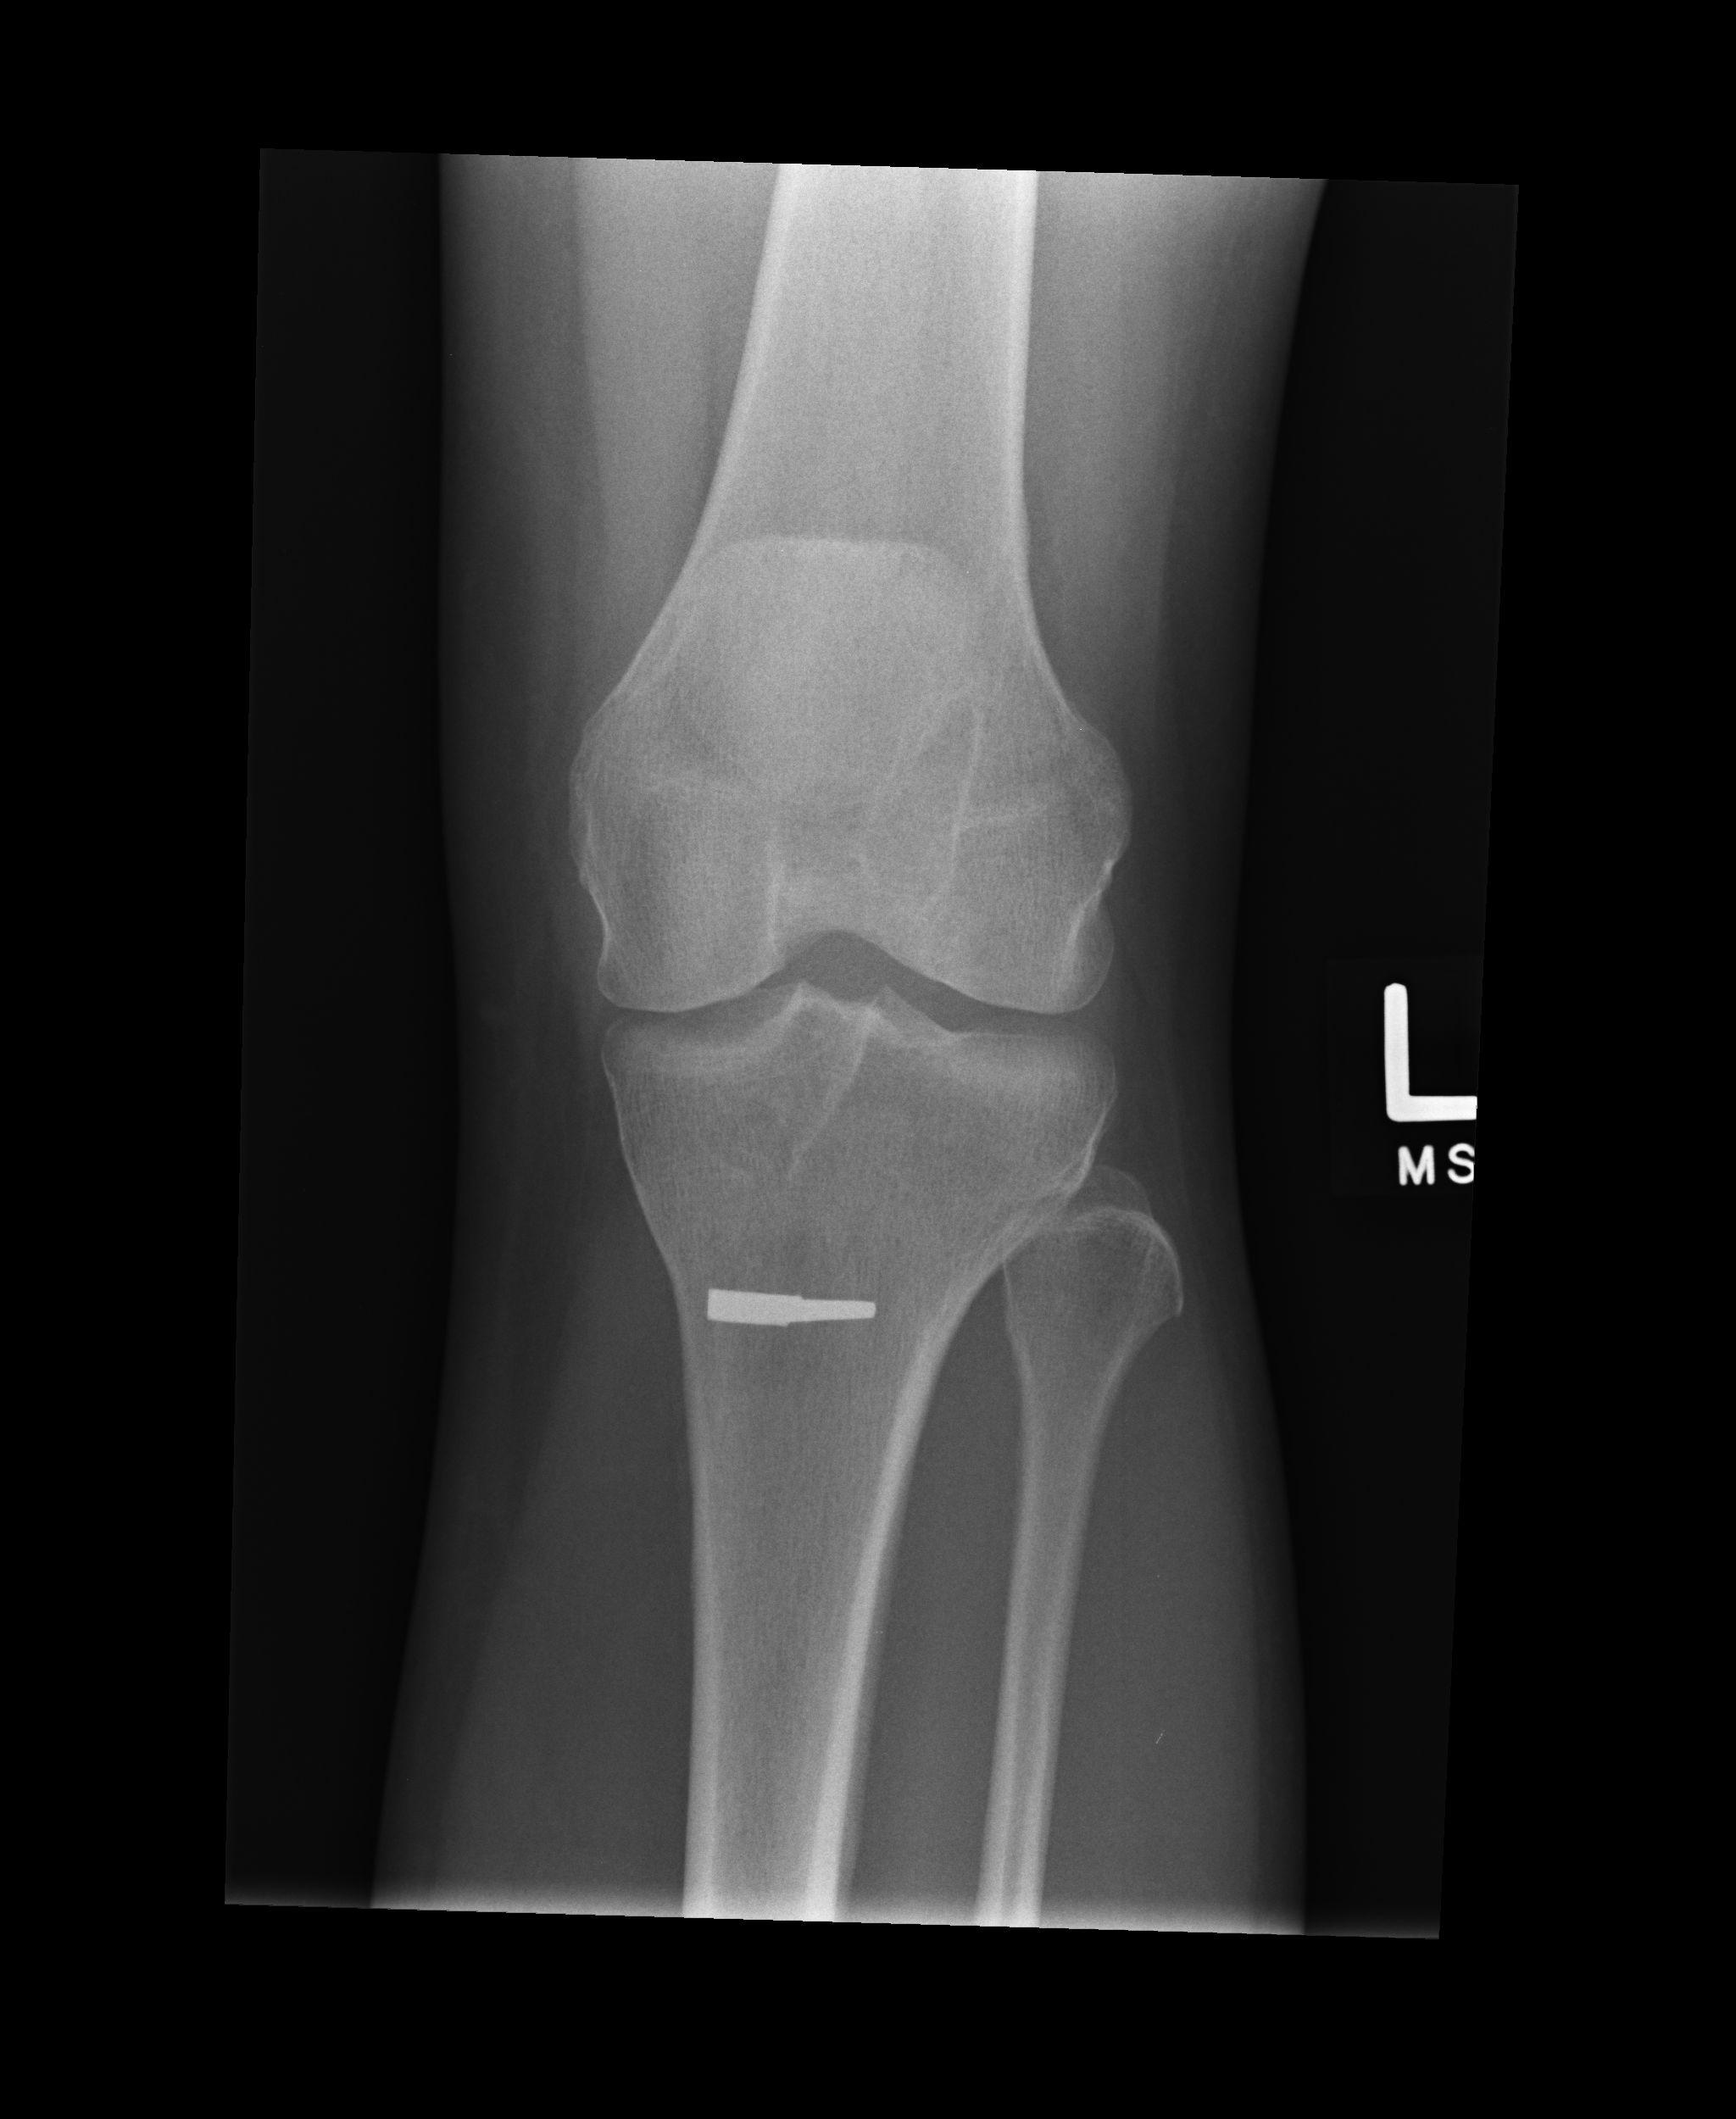 File:Left knee xray (5585922859).jpg - Wikimedia Commons